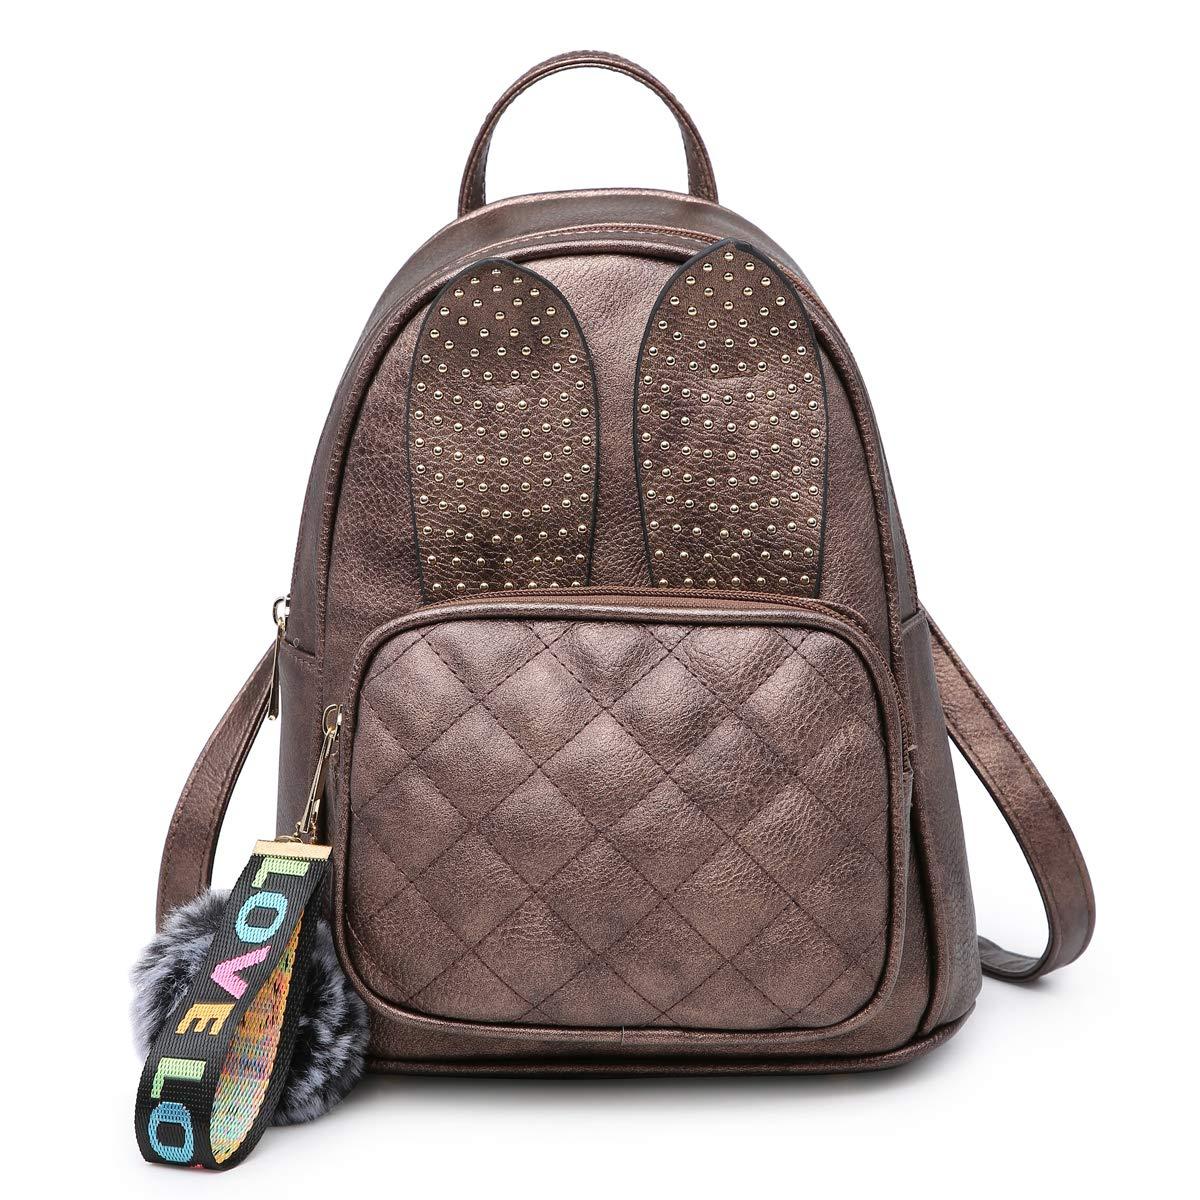 Girls Rabbit Ear Cute Mini Leather Backpack, XB Small Backpack Purse for Women Fashion Shoulder Bag (Bronze)